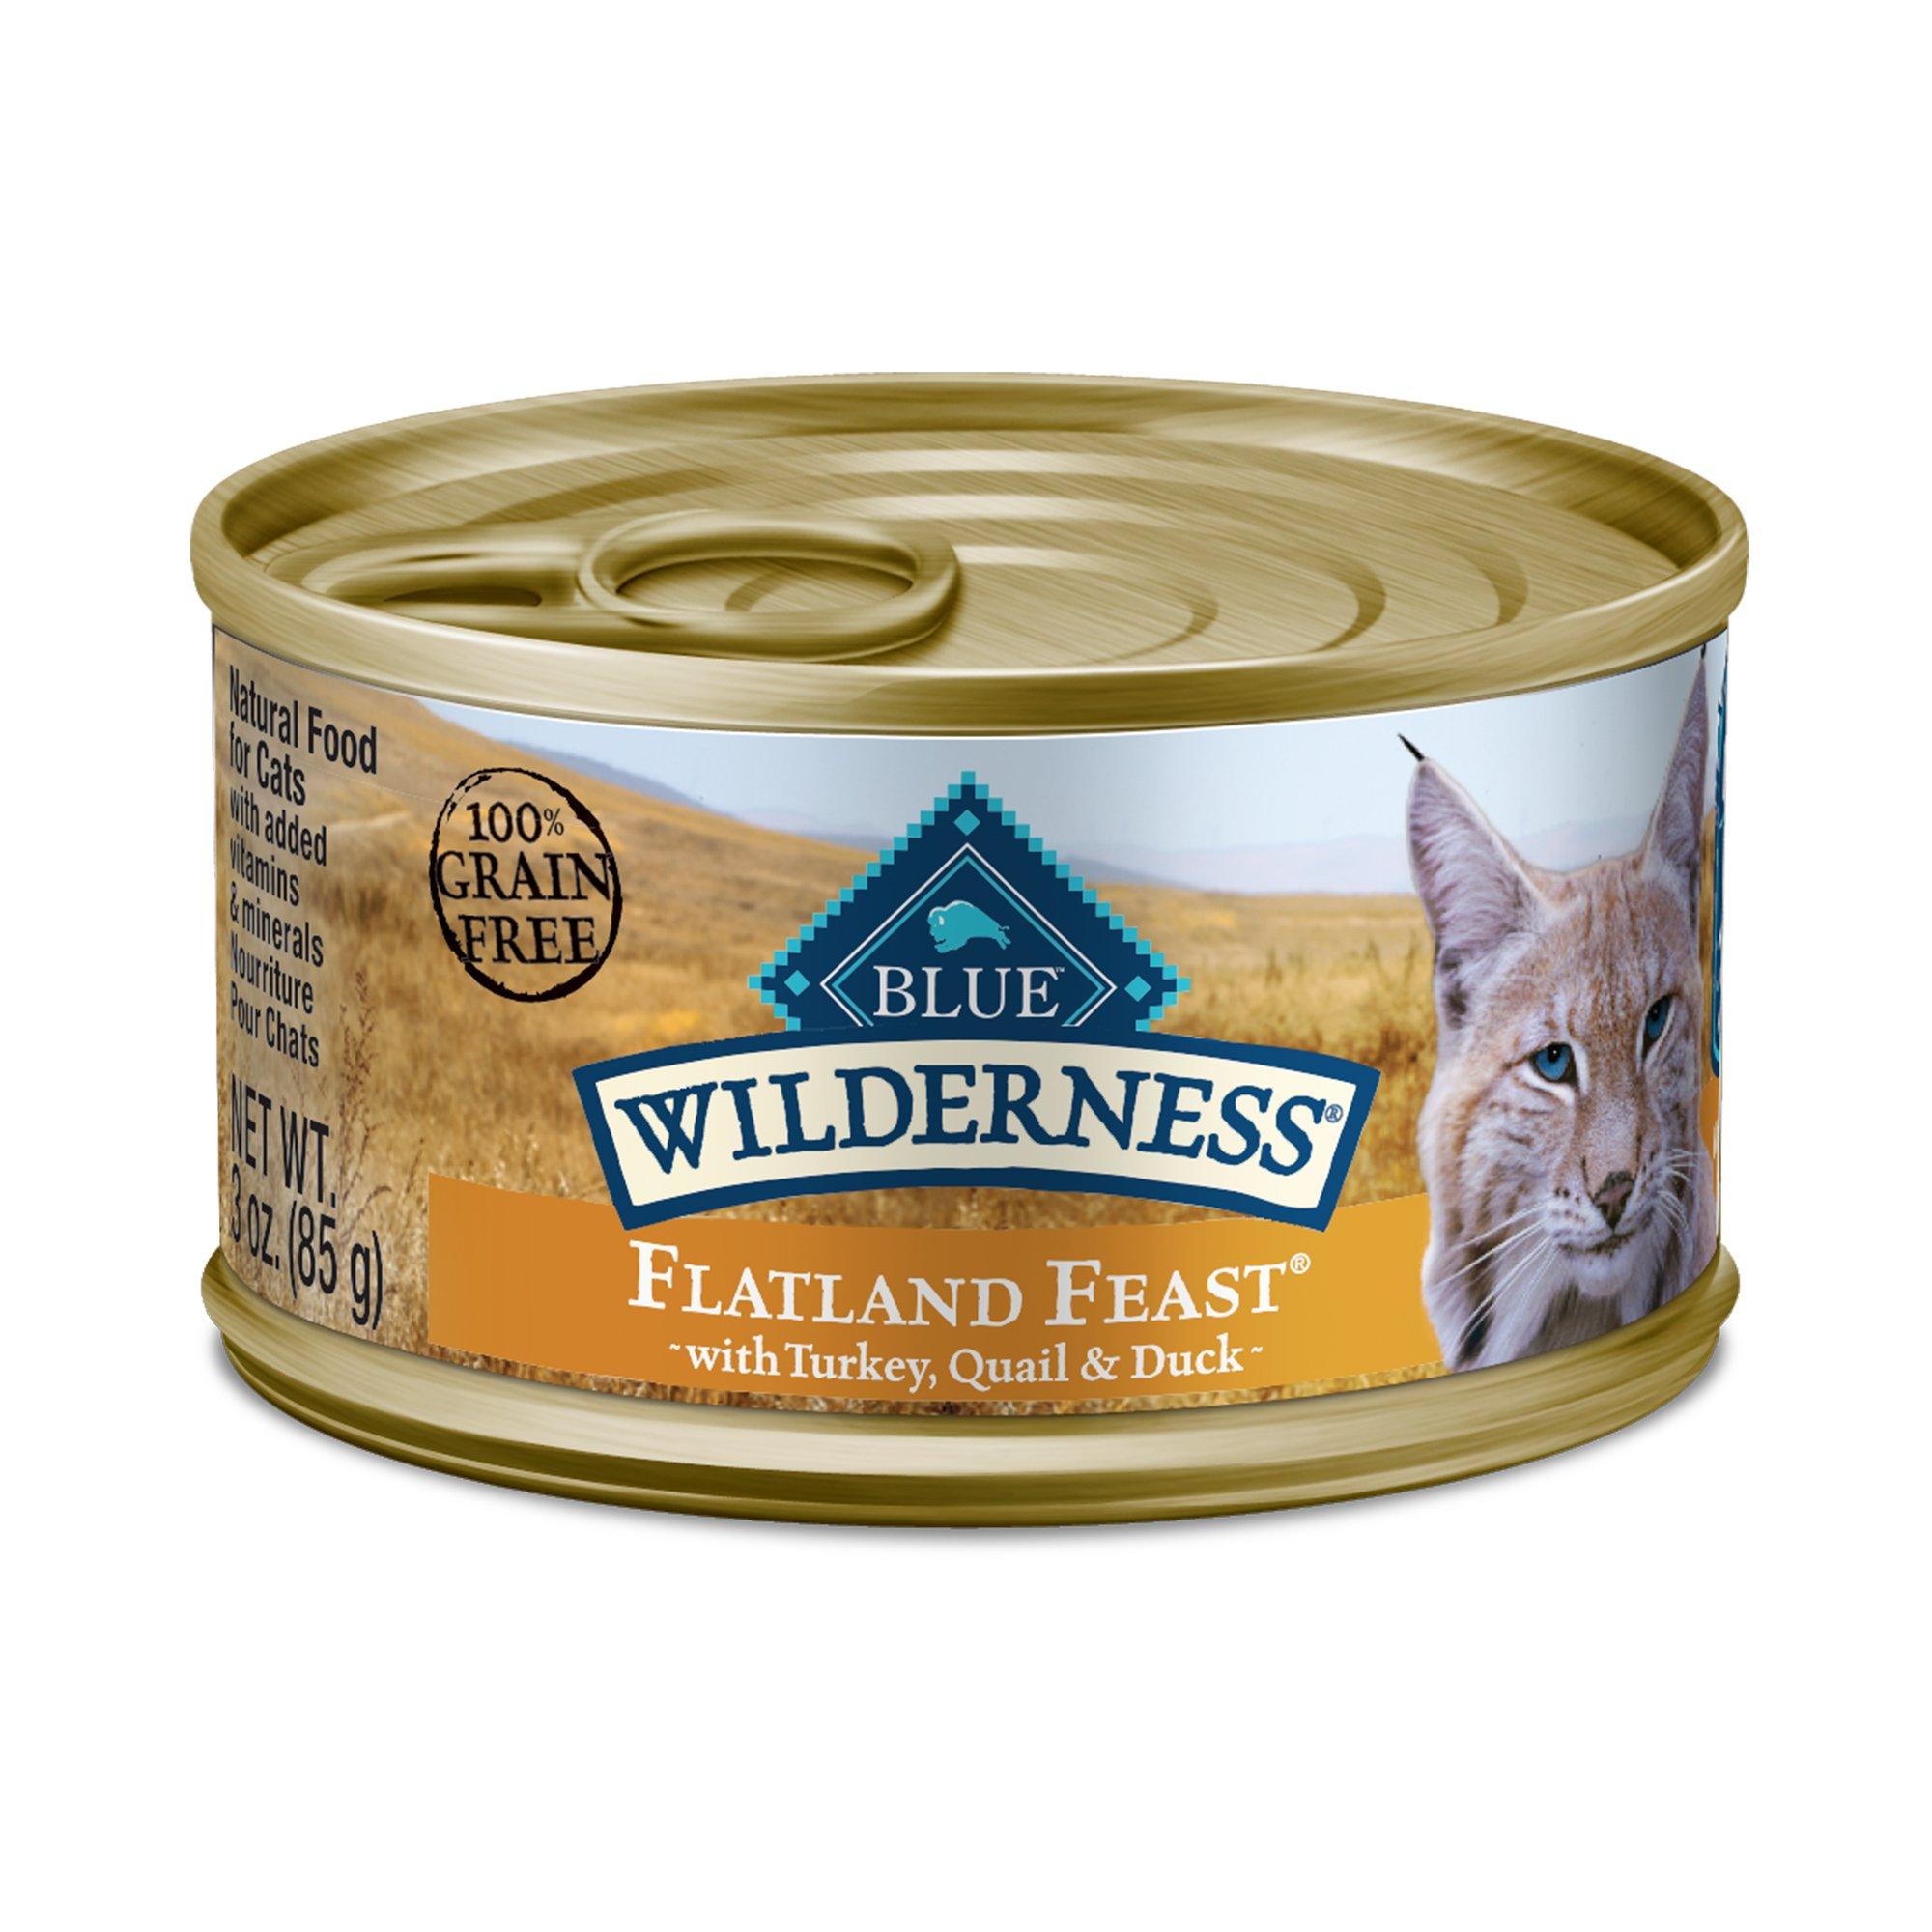 Blue Buffalo Wilderness Regionals Flatland Feast Wet Cat Food 3 Oz Case Of 24 24 X 3 Oz In 2019 Products Cat Food Canned Cat Food Food